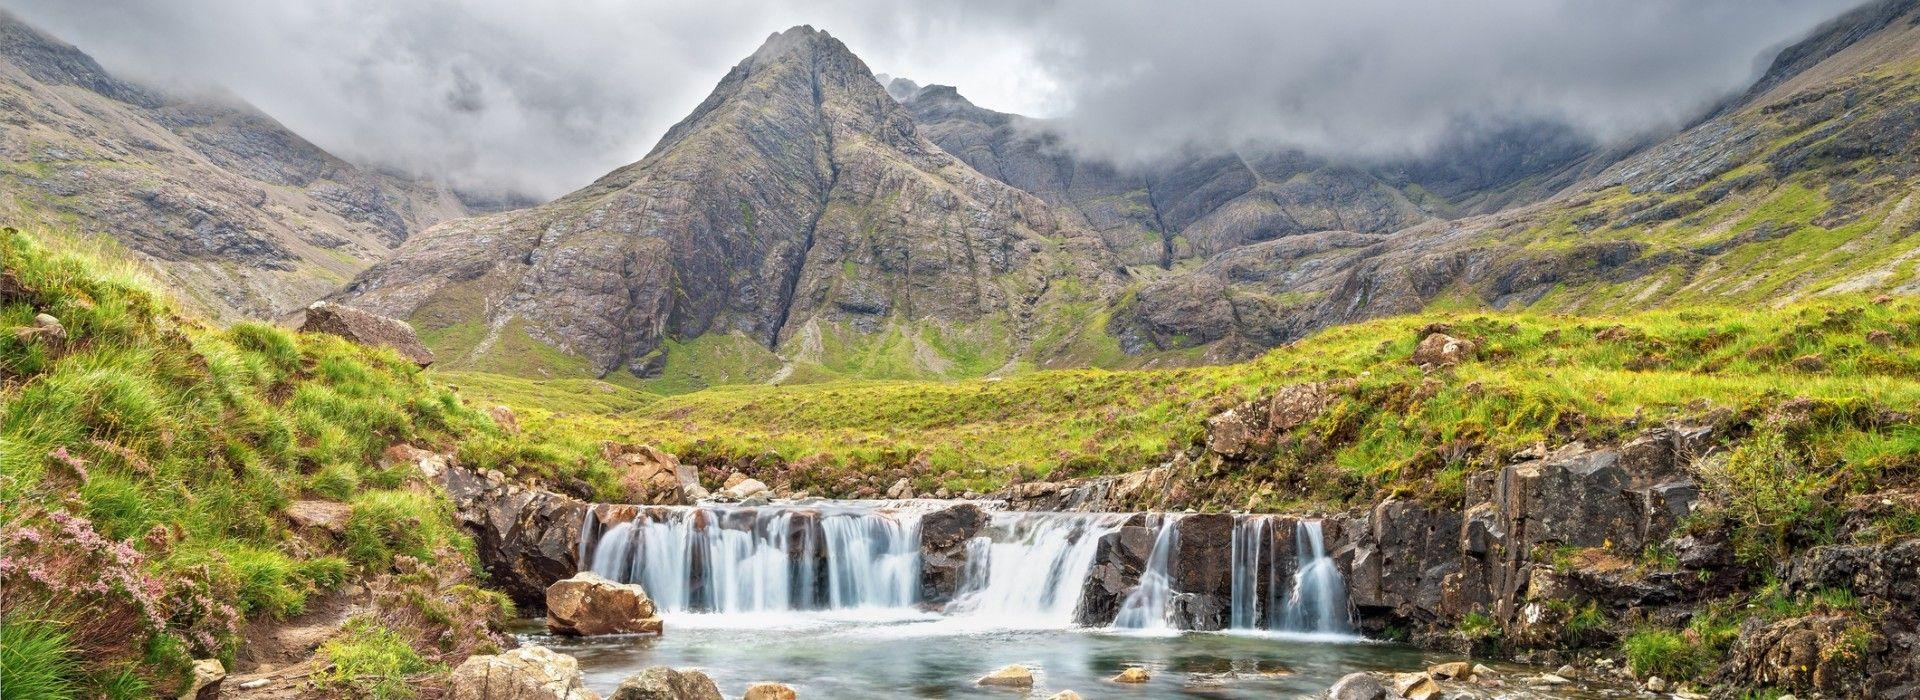 Luxury Tours in Scotland